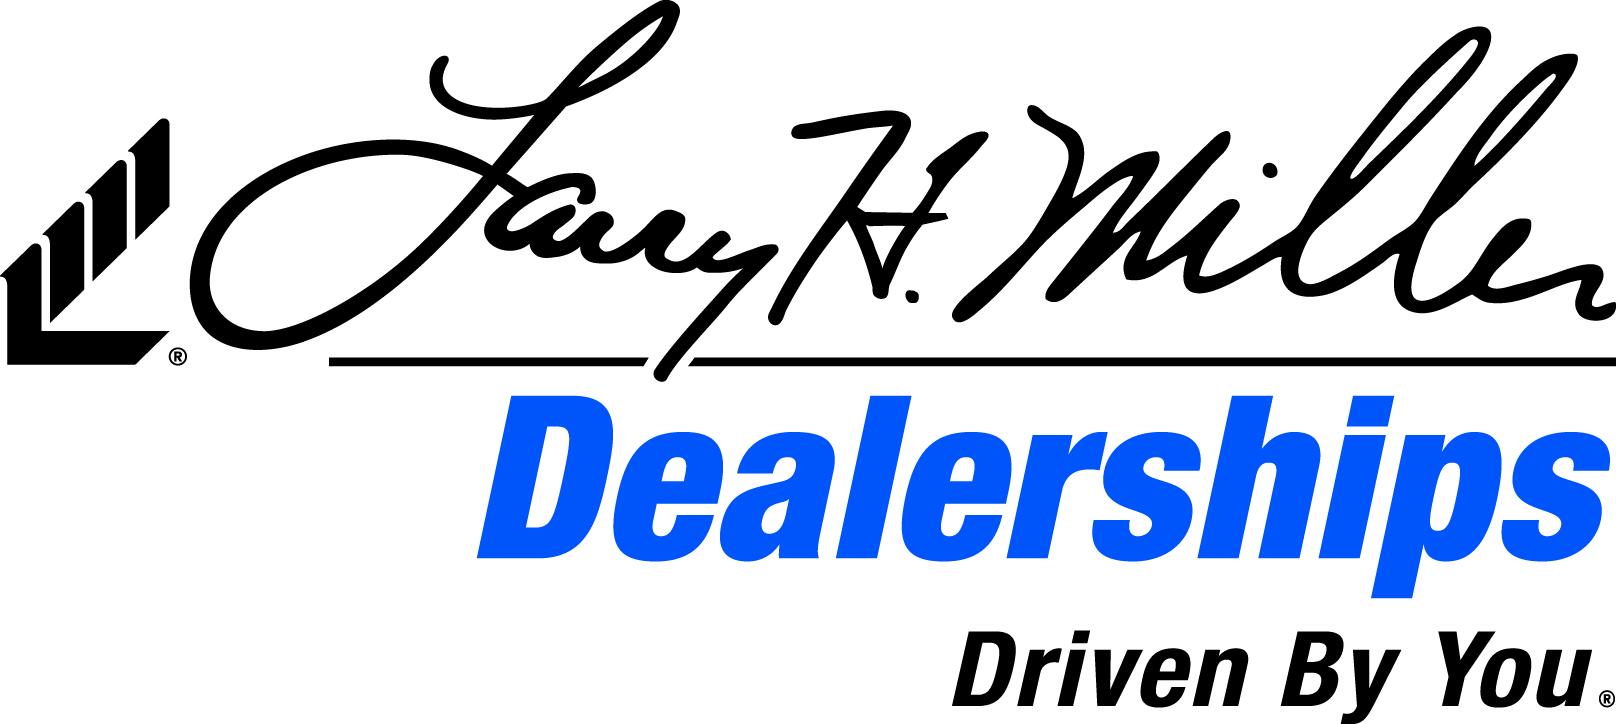 Larry H Miller Dodge >> Larry H. Miller Dealerships Announces Largest Dealer Group Acquisition in Company History ...